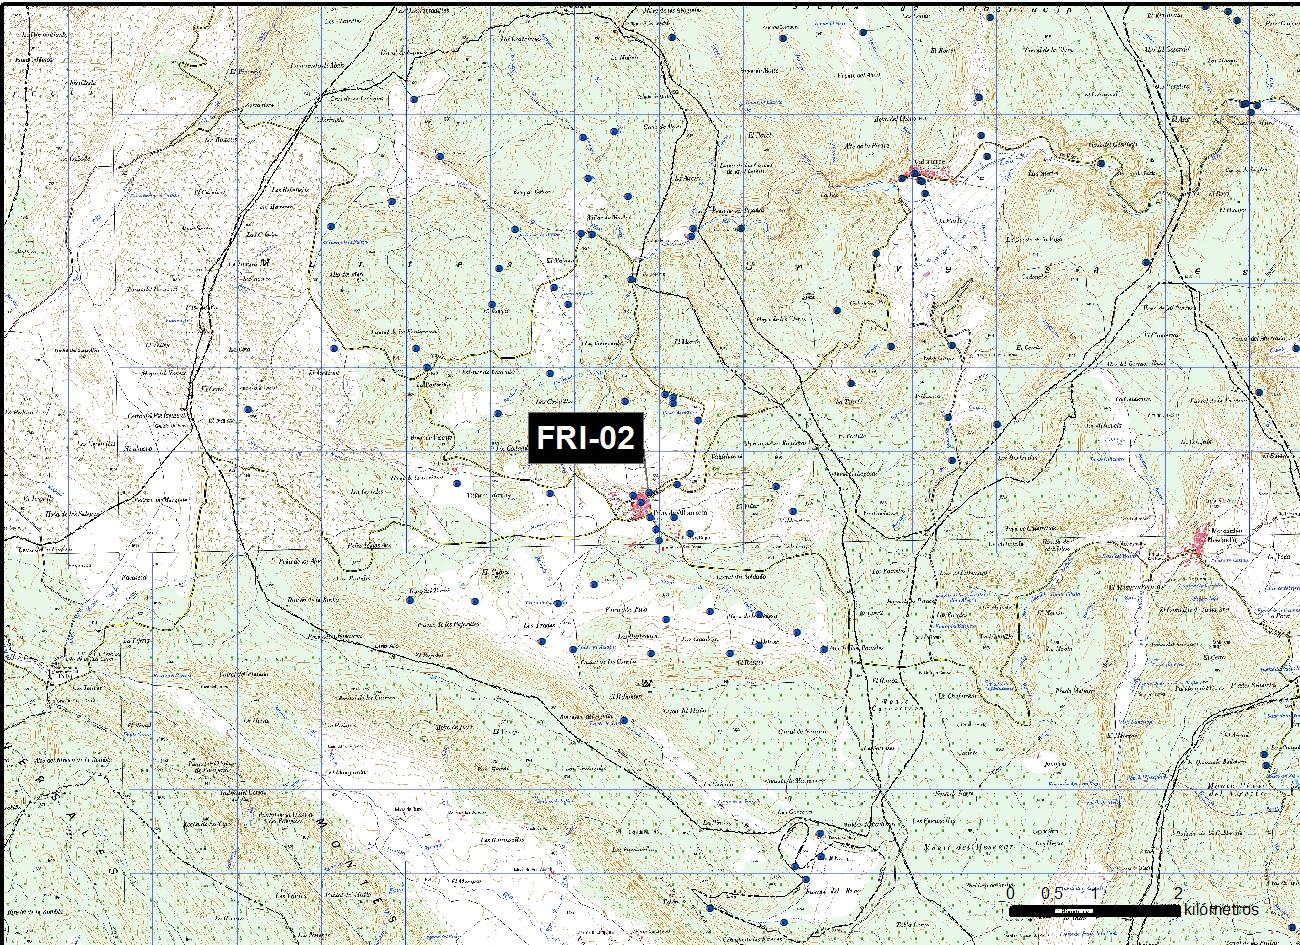 FRI_02_M.V.LOZANO_PUERTA FORESTAL_MAP.TOPO 1